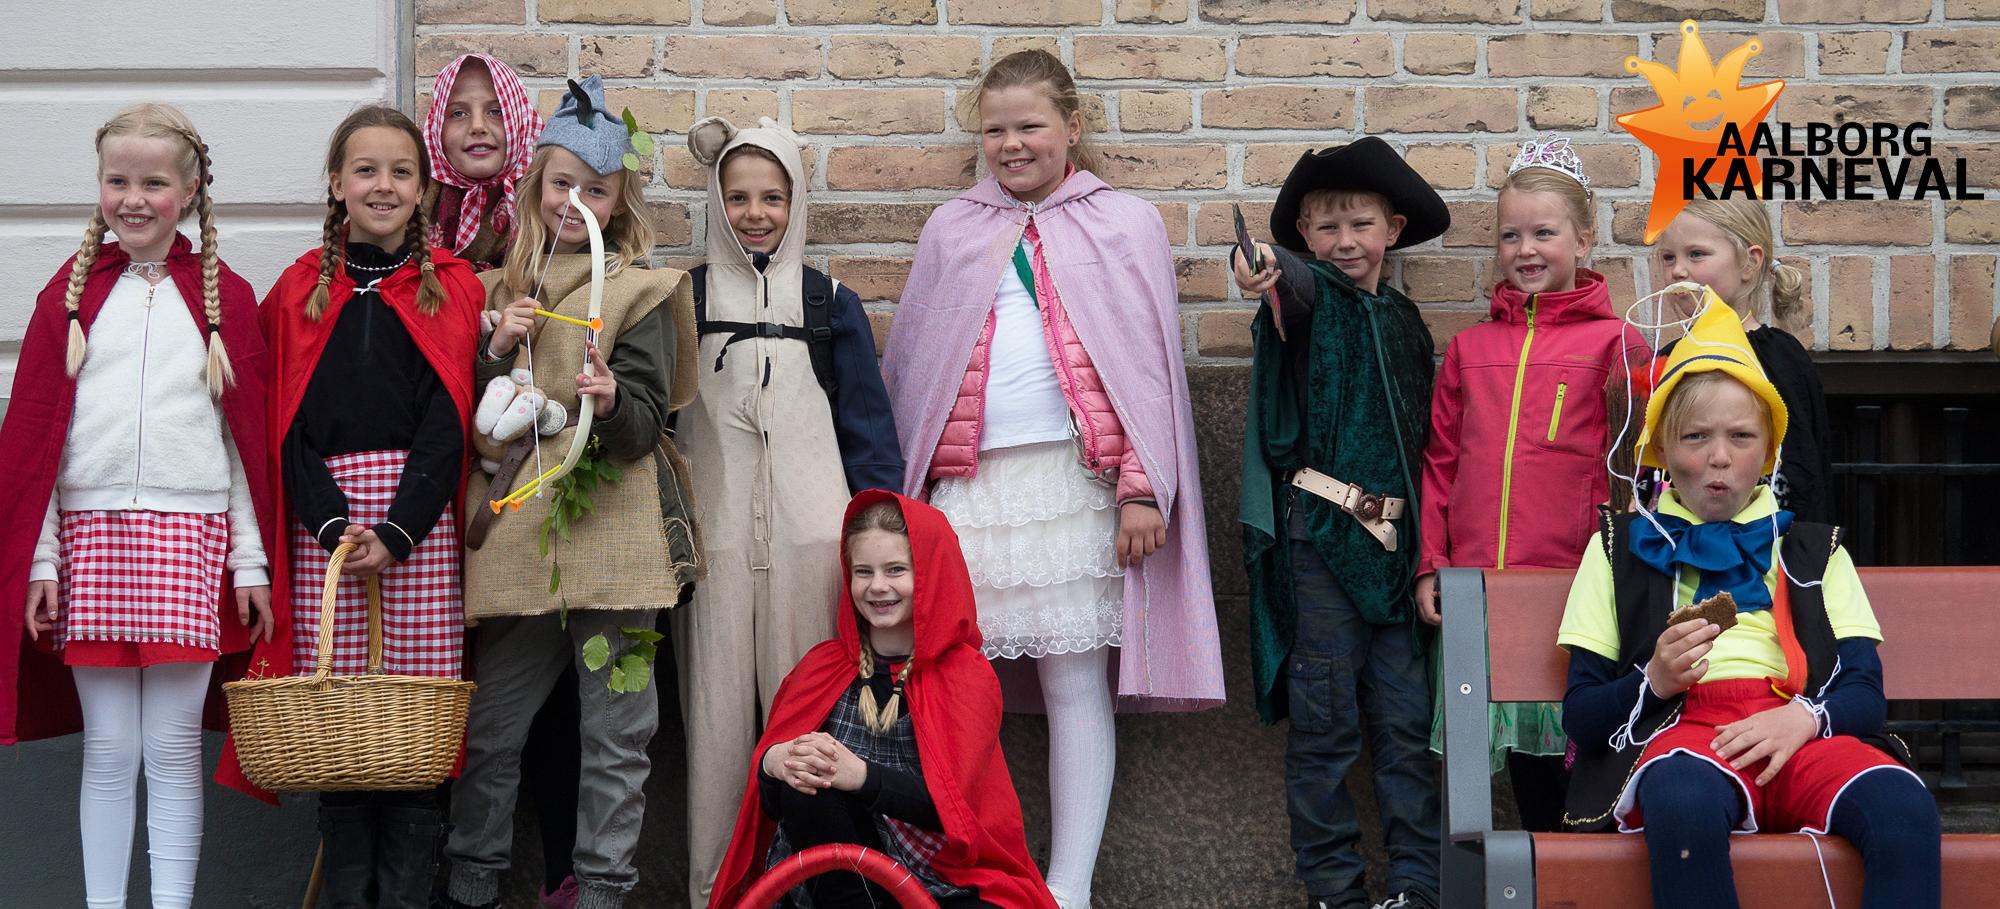 Børnekarneval – Aalborg